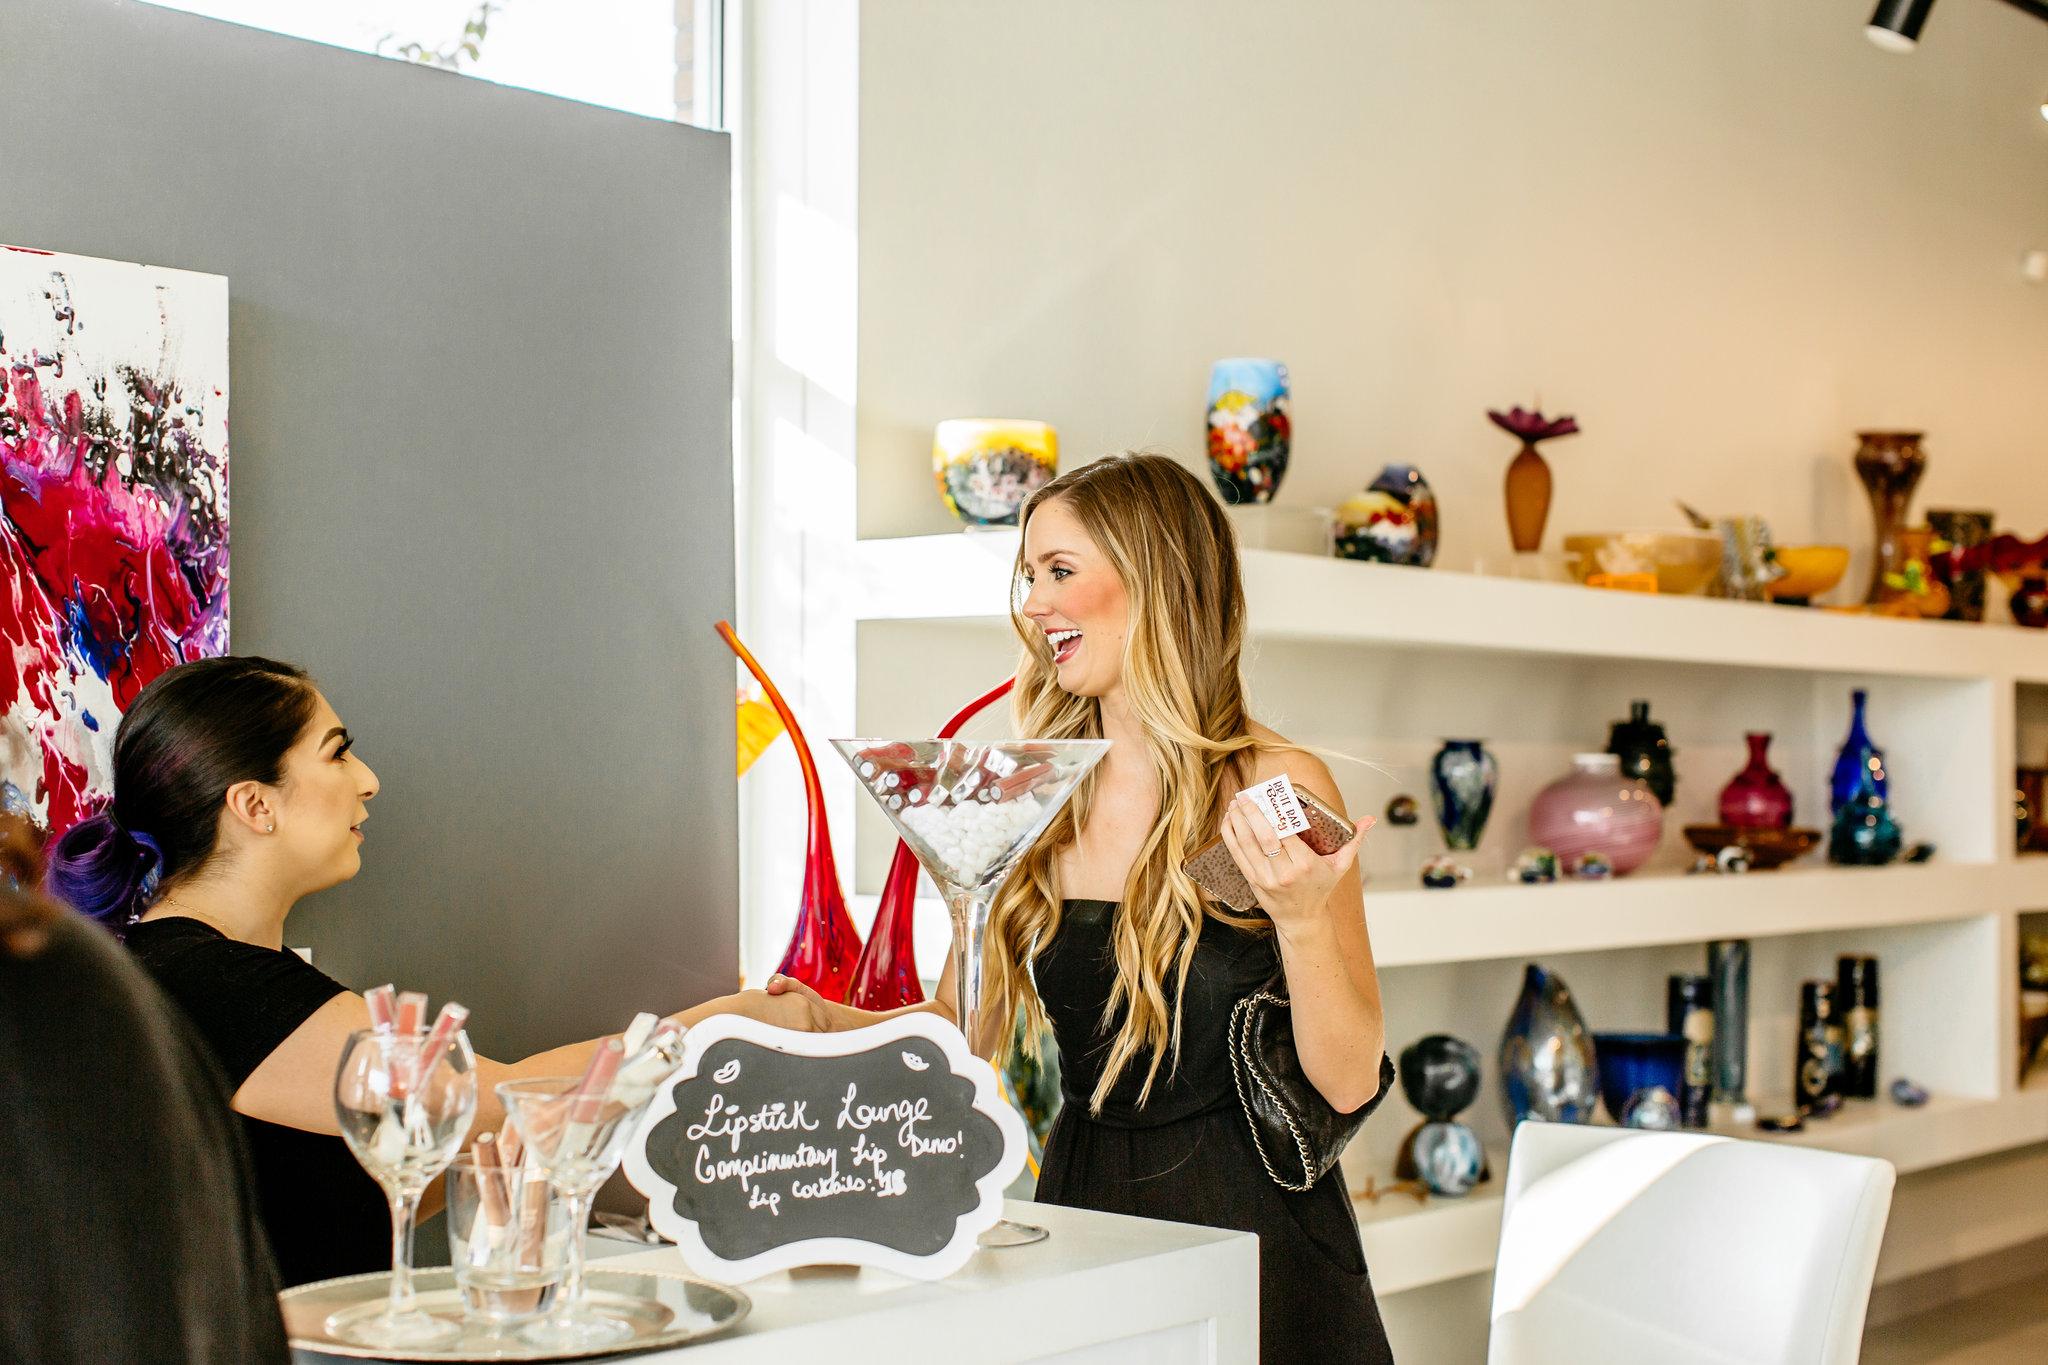 Alexa-Vossler-Photo_Dallas-Event-Photographer_Brite-Bar-Beauty-2018-Lipstick-Launch-Party-86.jpg